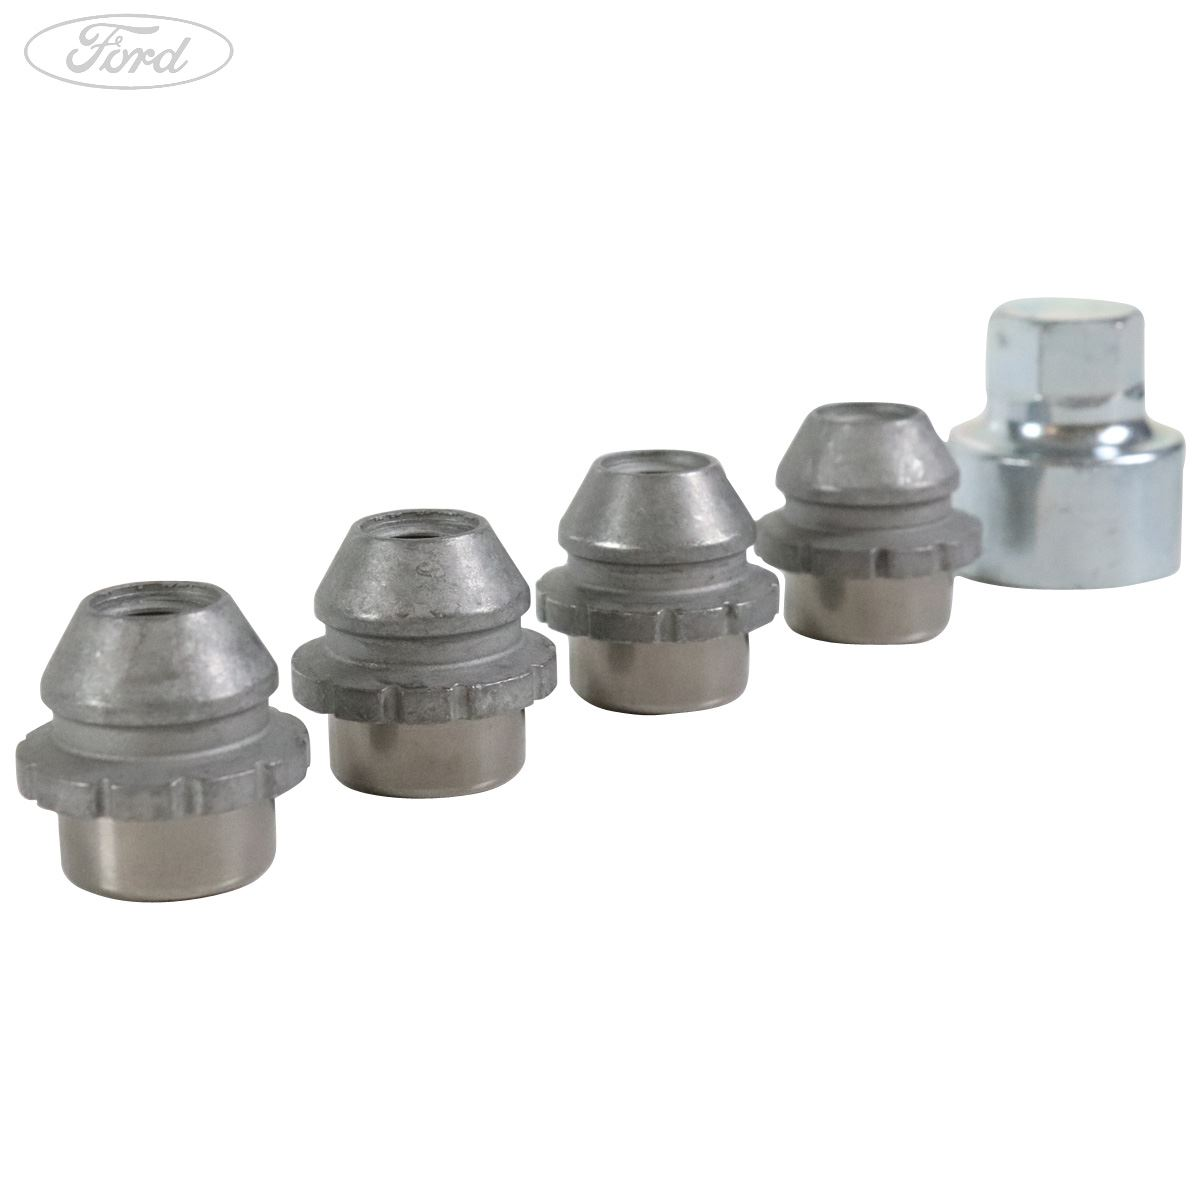 Ford Focus//Fiesta//Mondeo Locking Wheel Nut Set 1 removal key 4 locking nuts